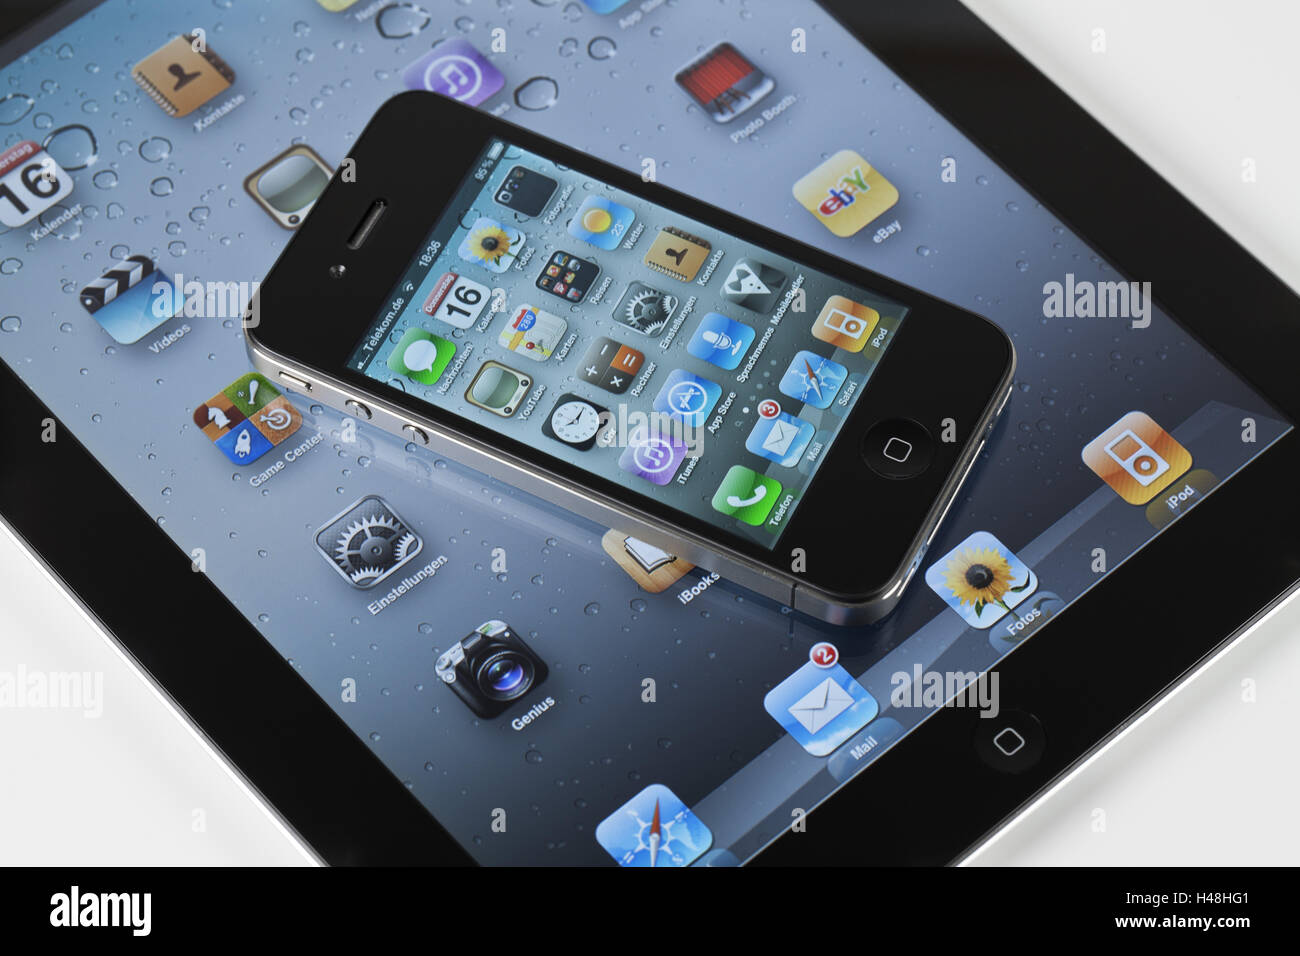 iPad 2, iPhone 4, display, Apps, programs, medium close-up, multi-air function, - Stock Image